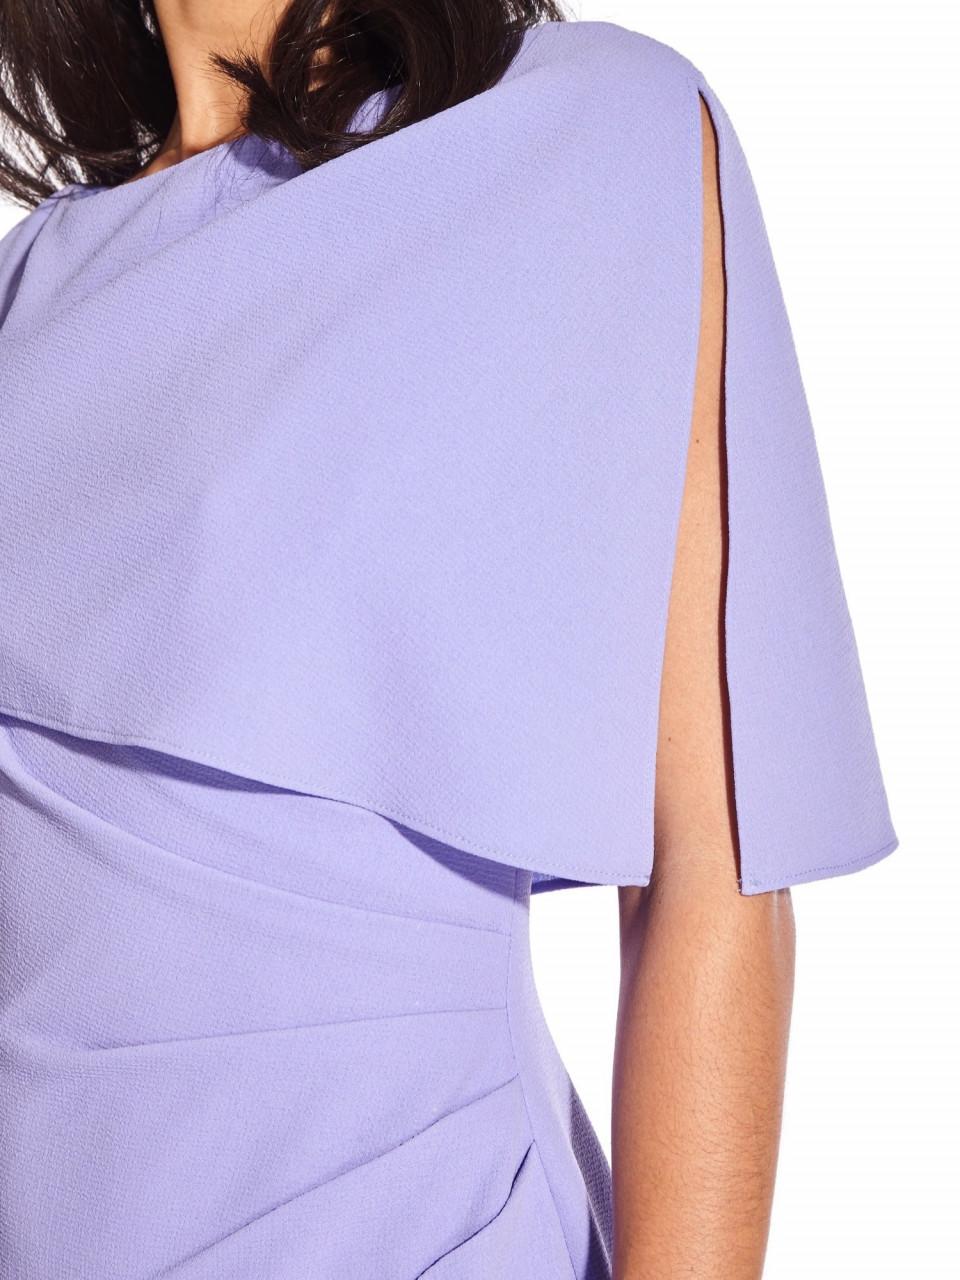 Boat neck cape sheath dress